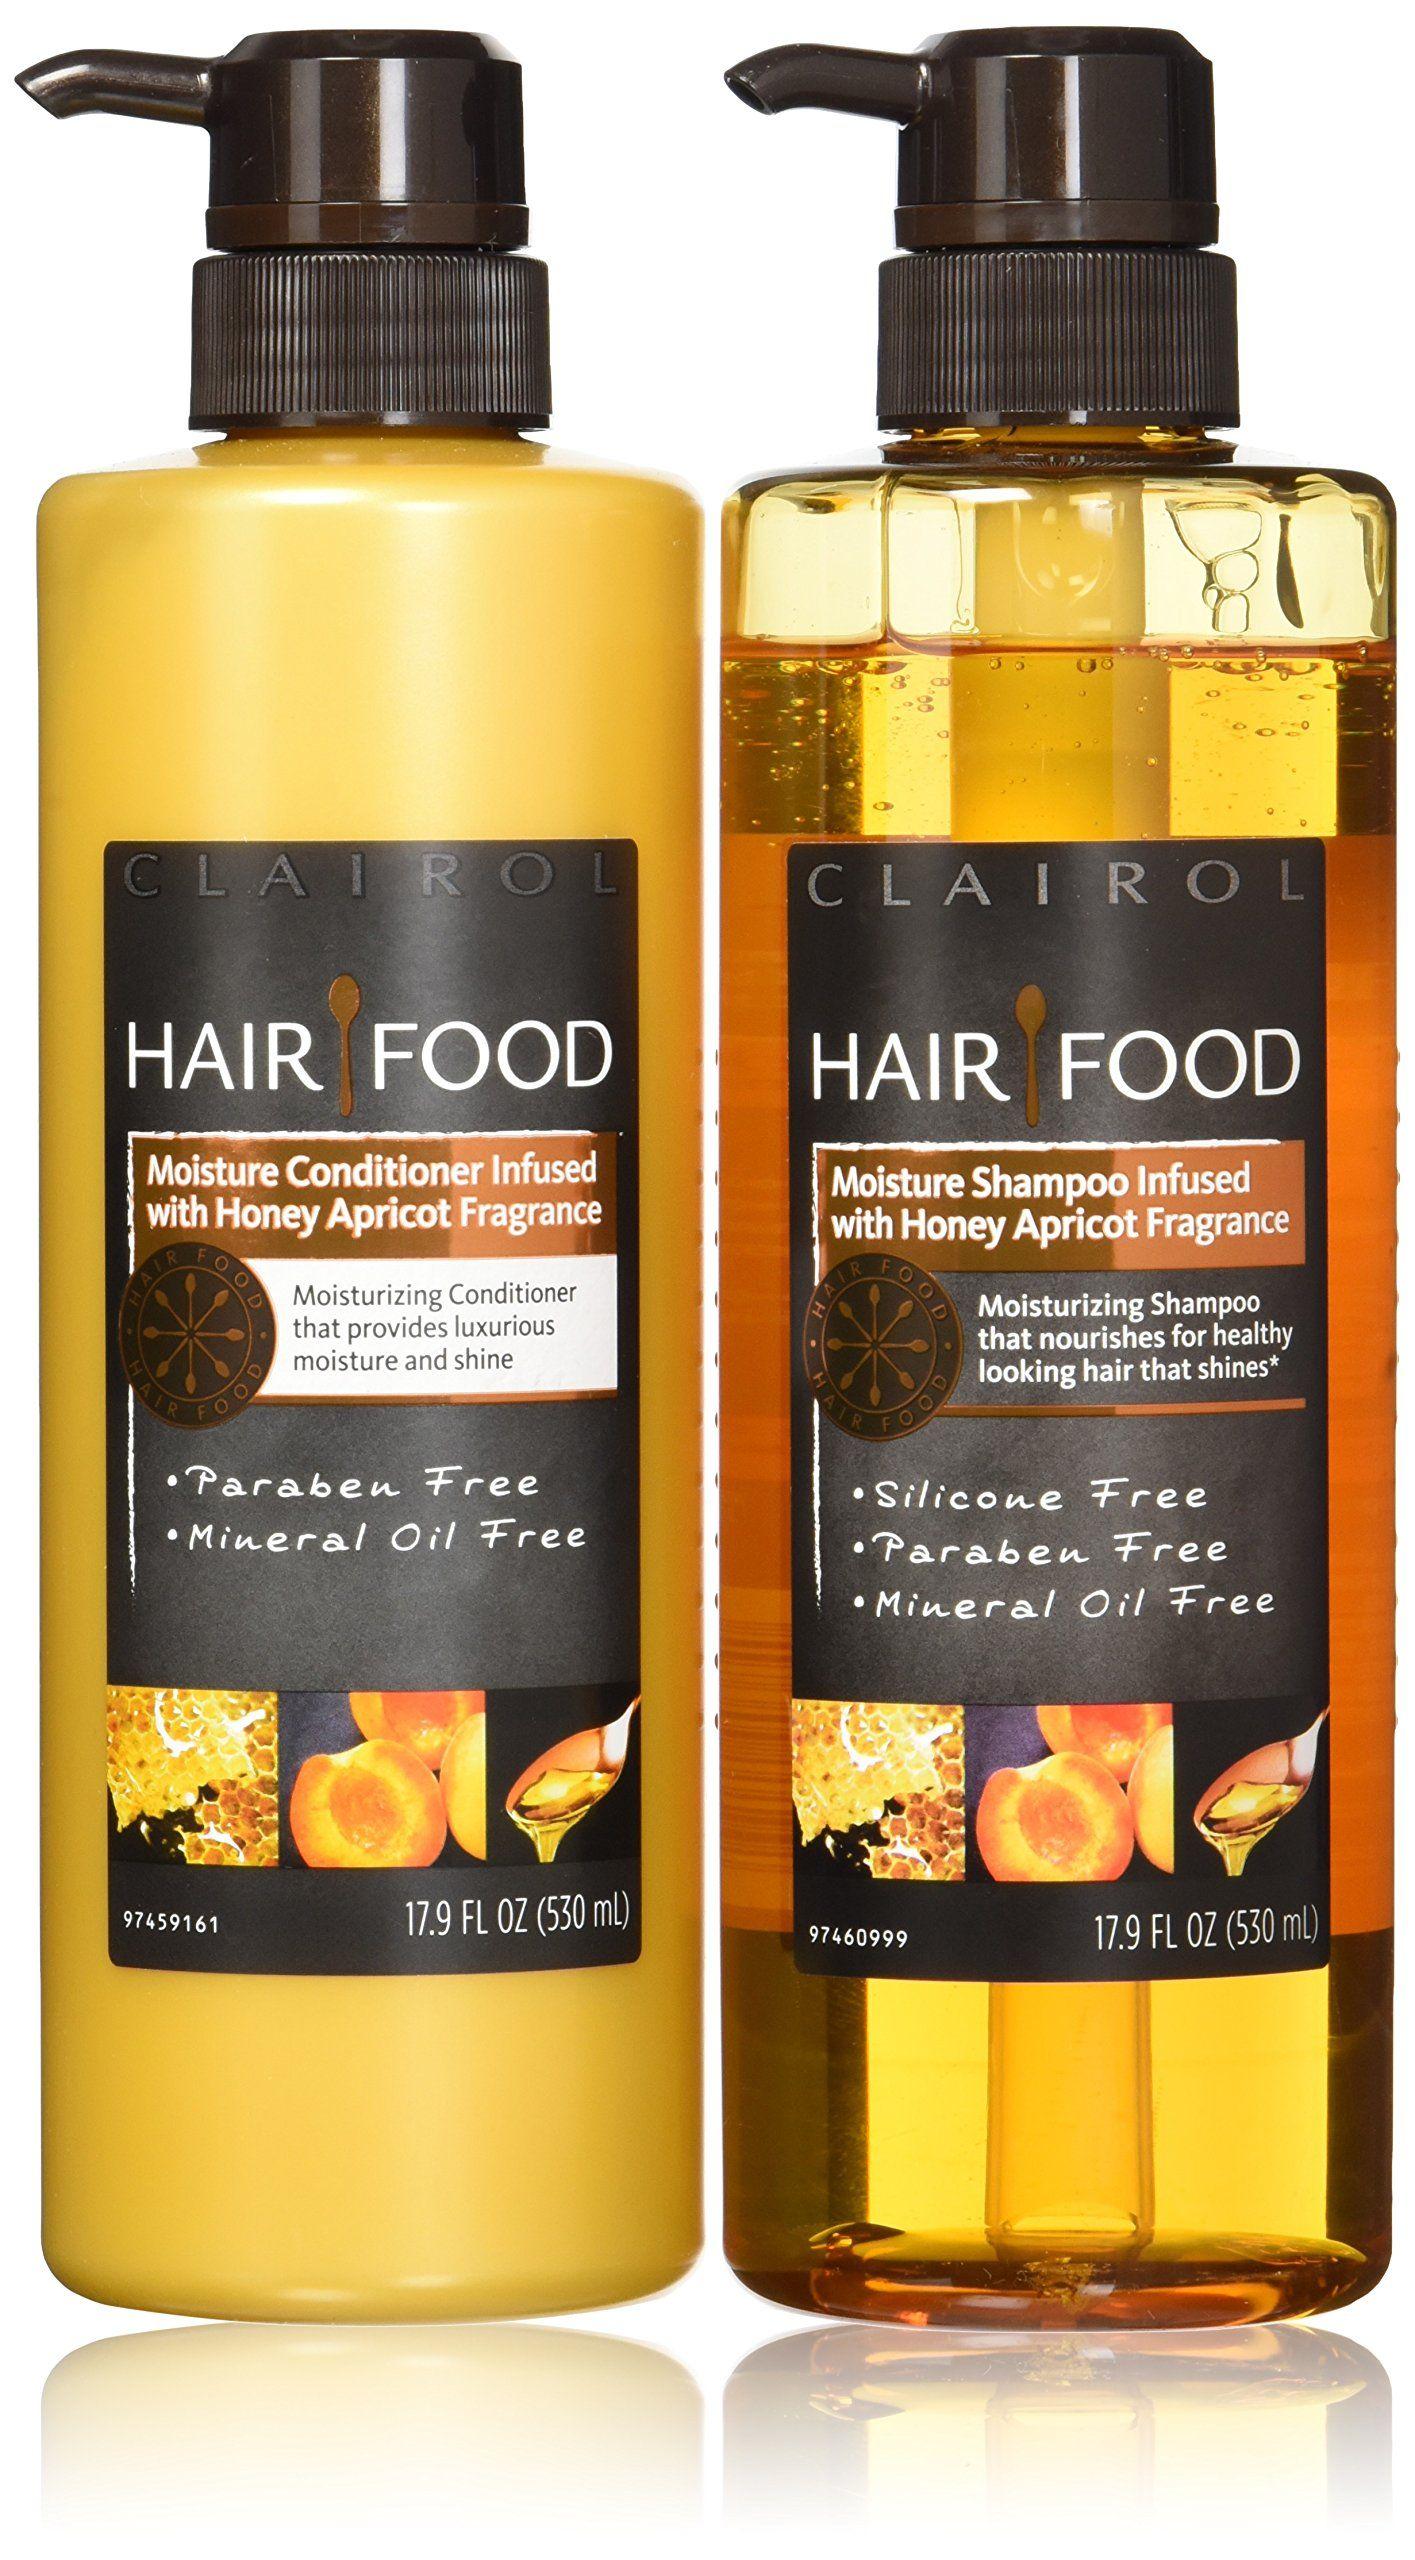 Hair Food Moisture Shampoo ShampooIdeas Hair food